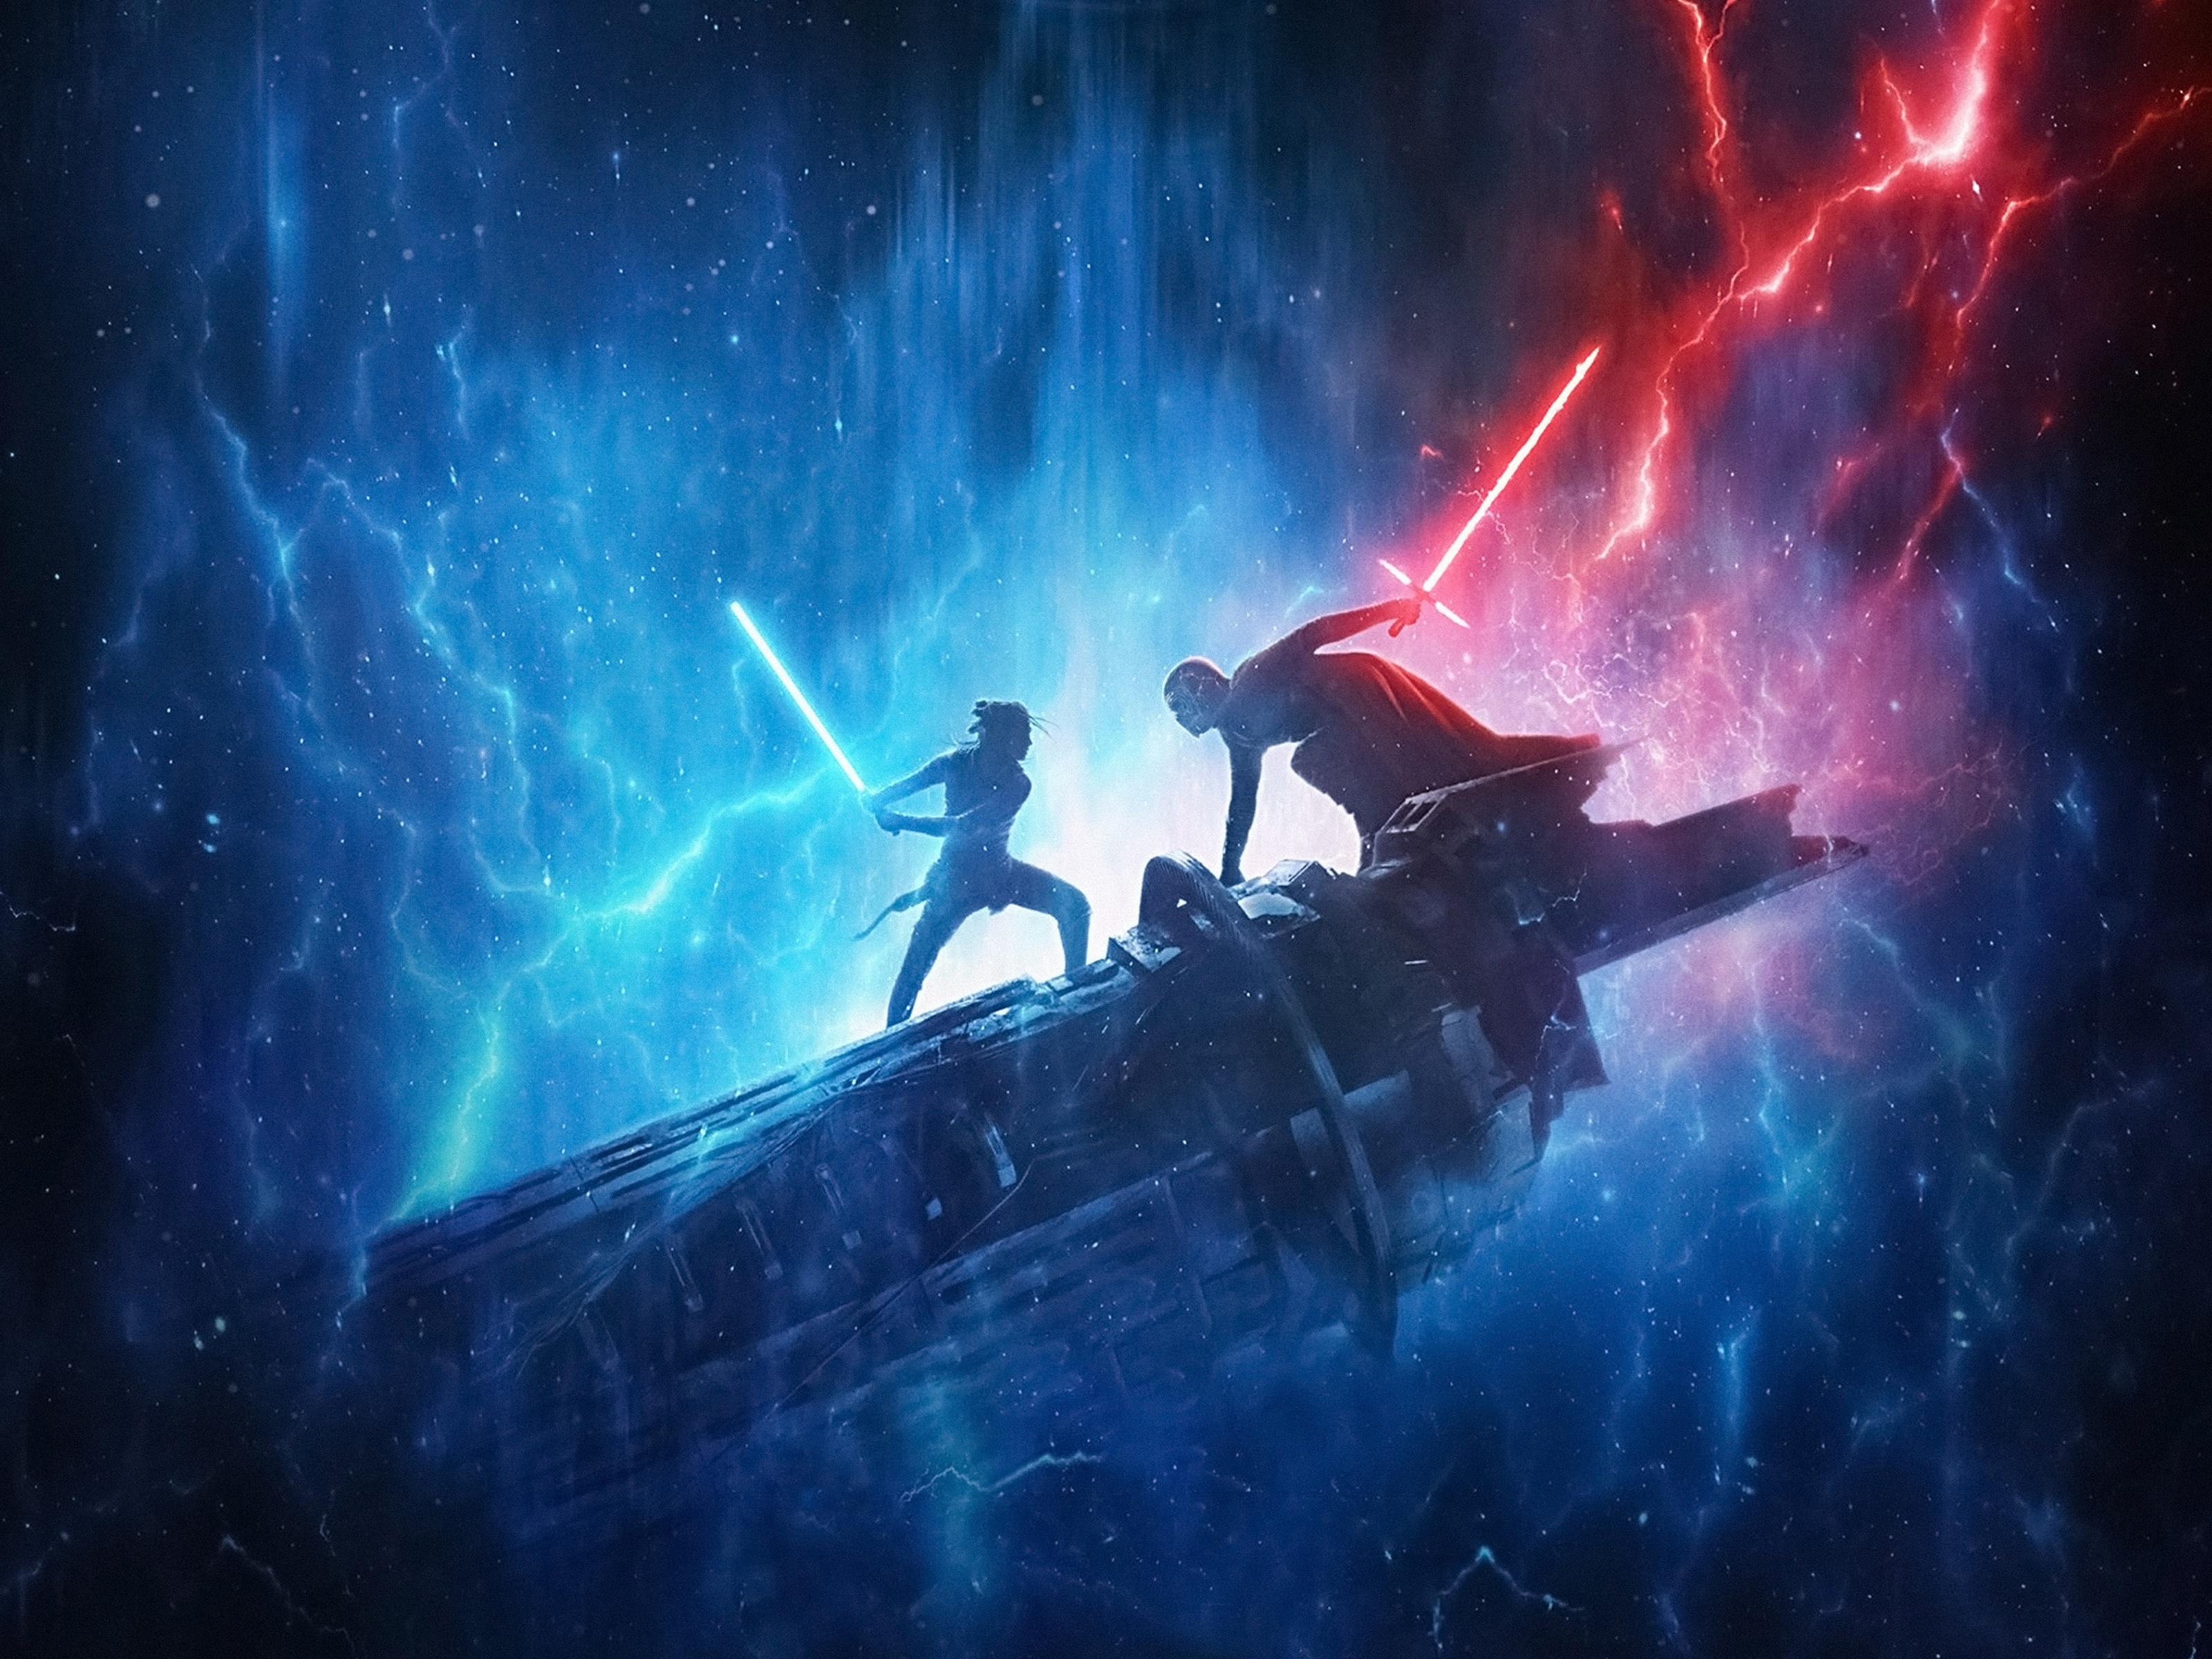 Star Wars The Rise Of Skywalker Fondo De Pantalla Hd